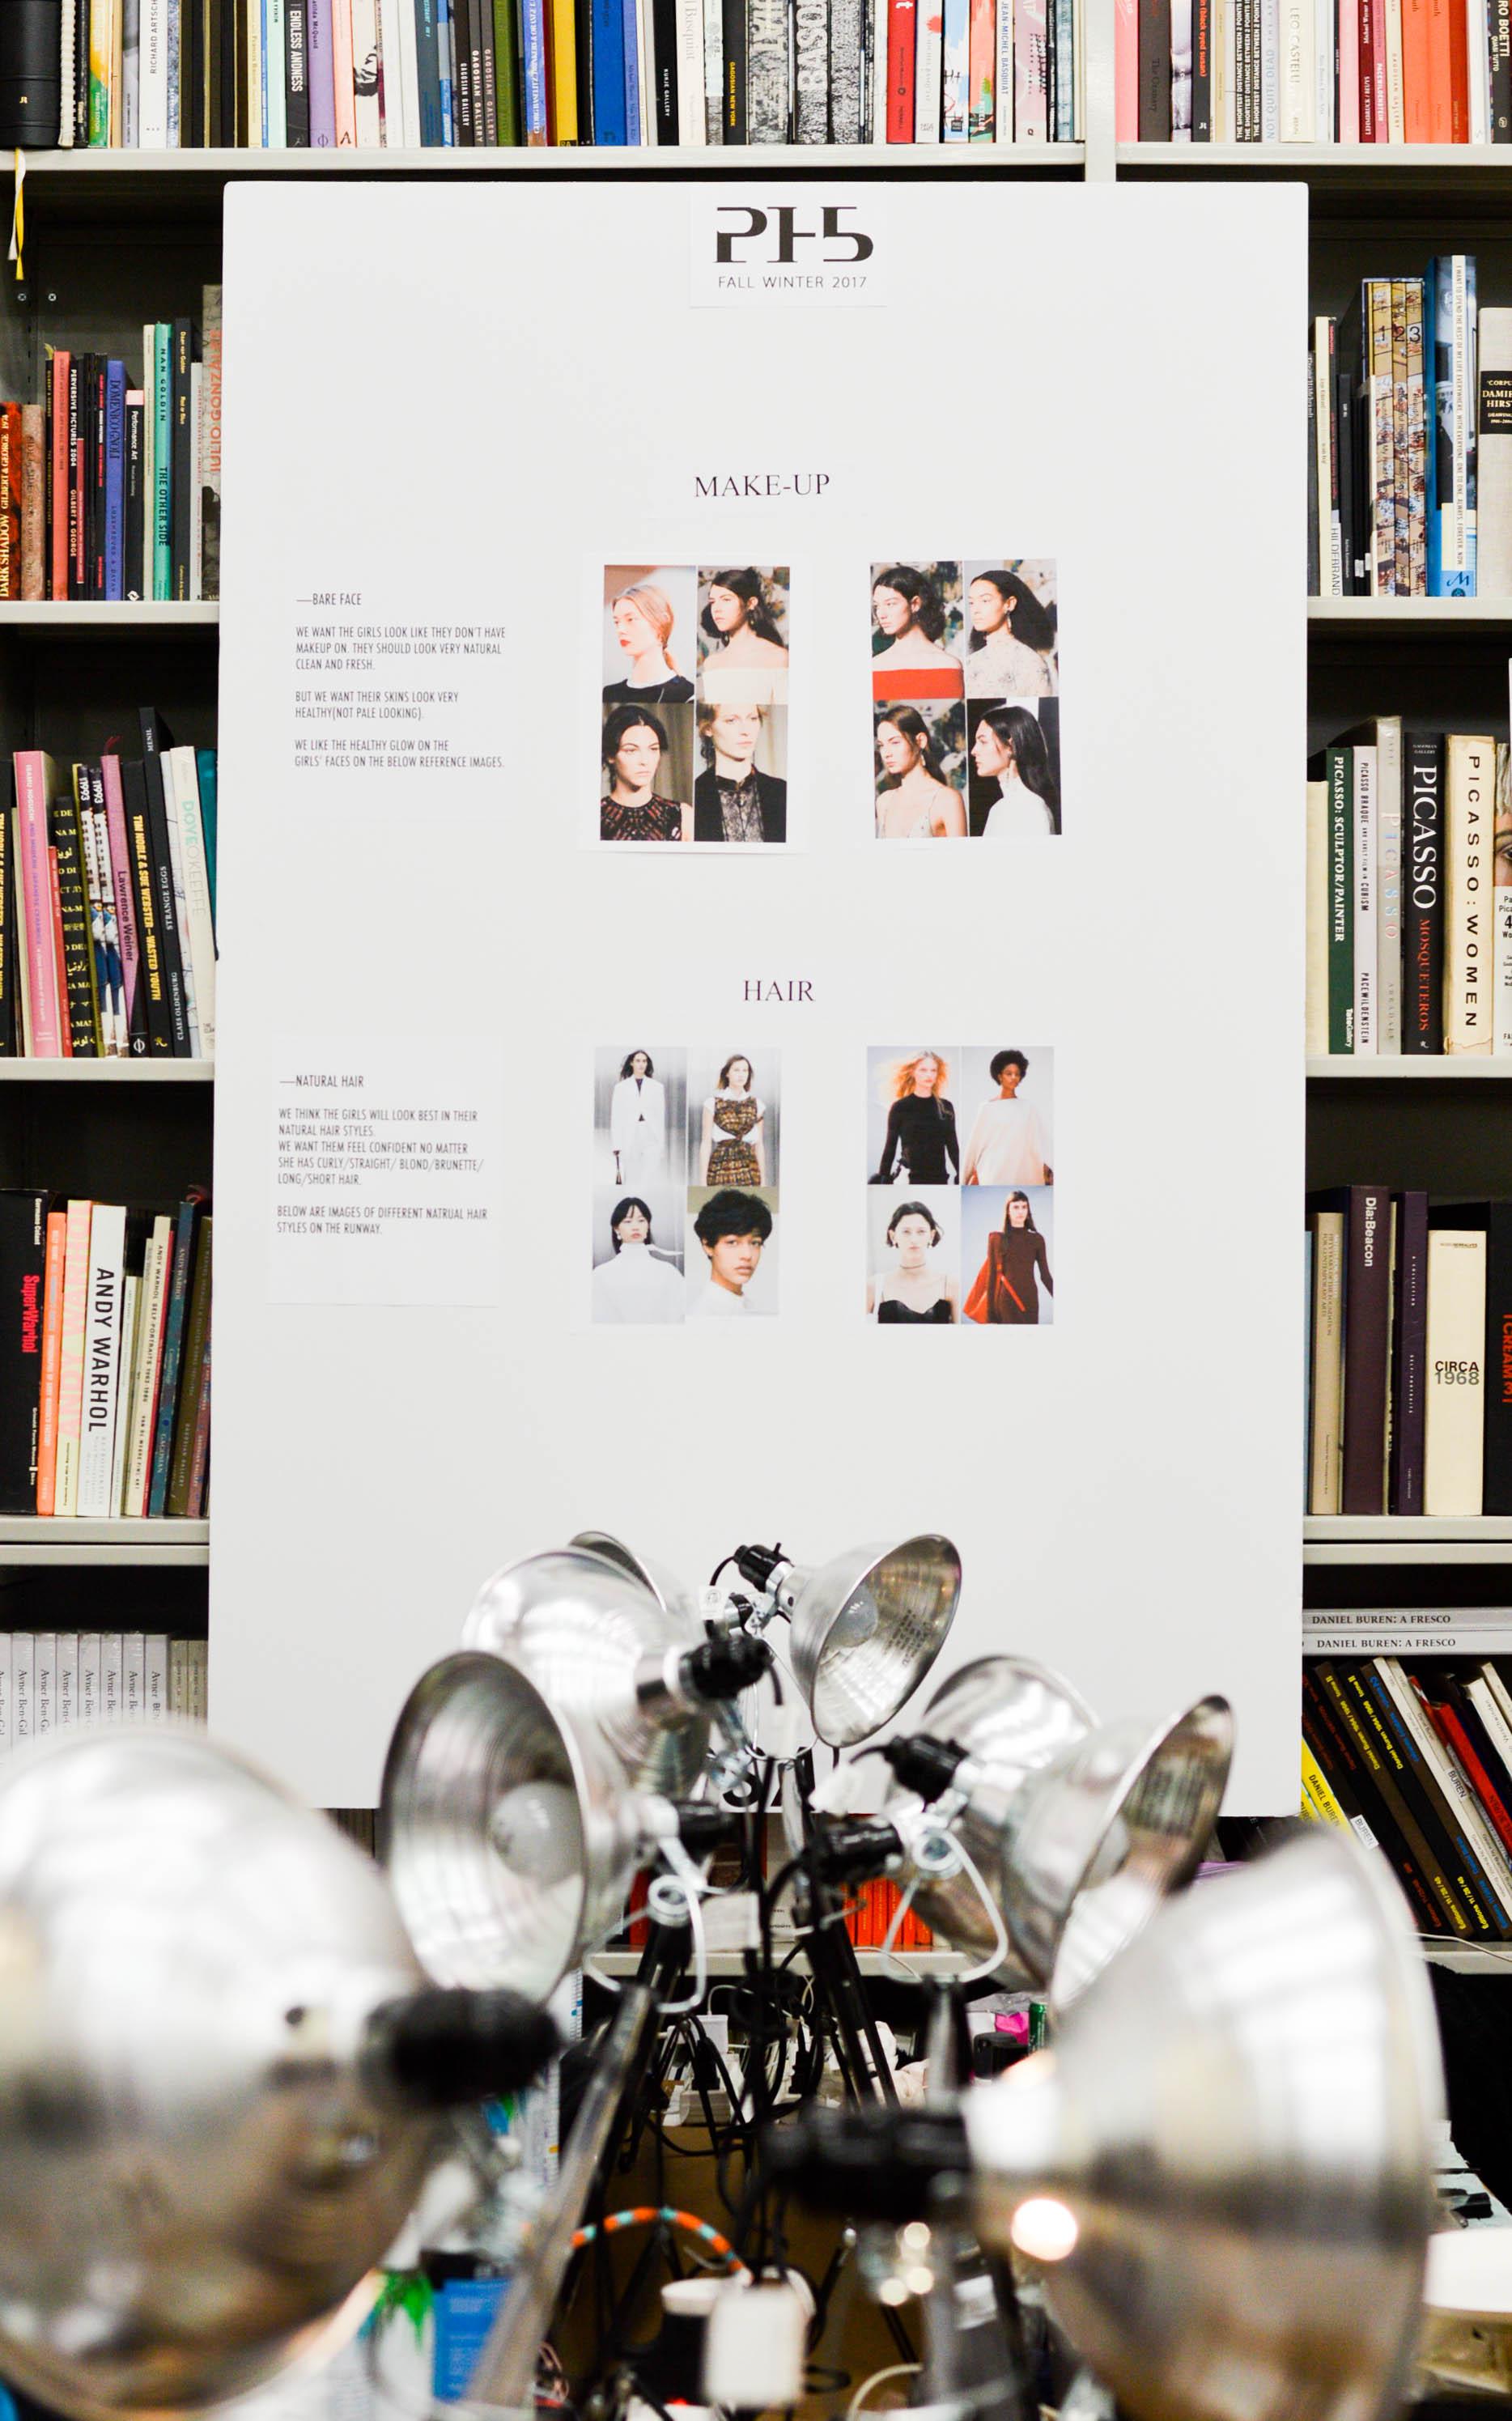 Beauty Concept Board at PH5 NYFW F/W17